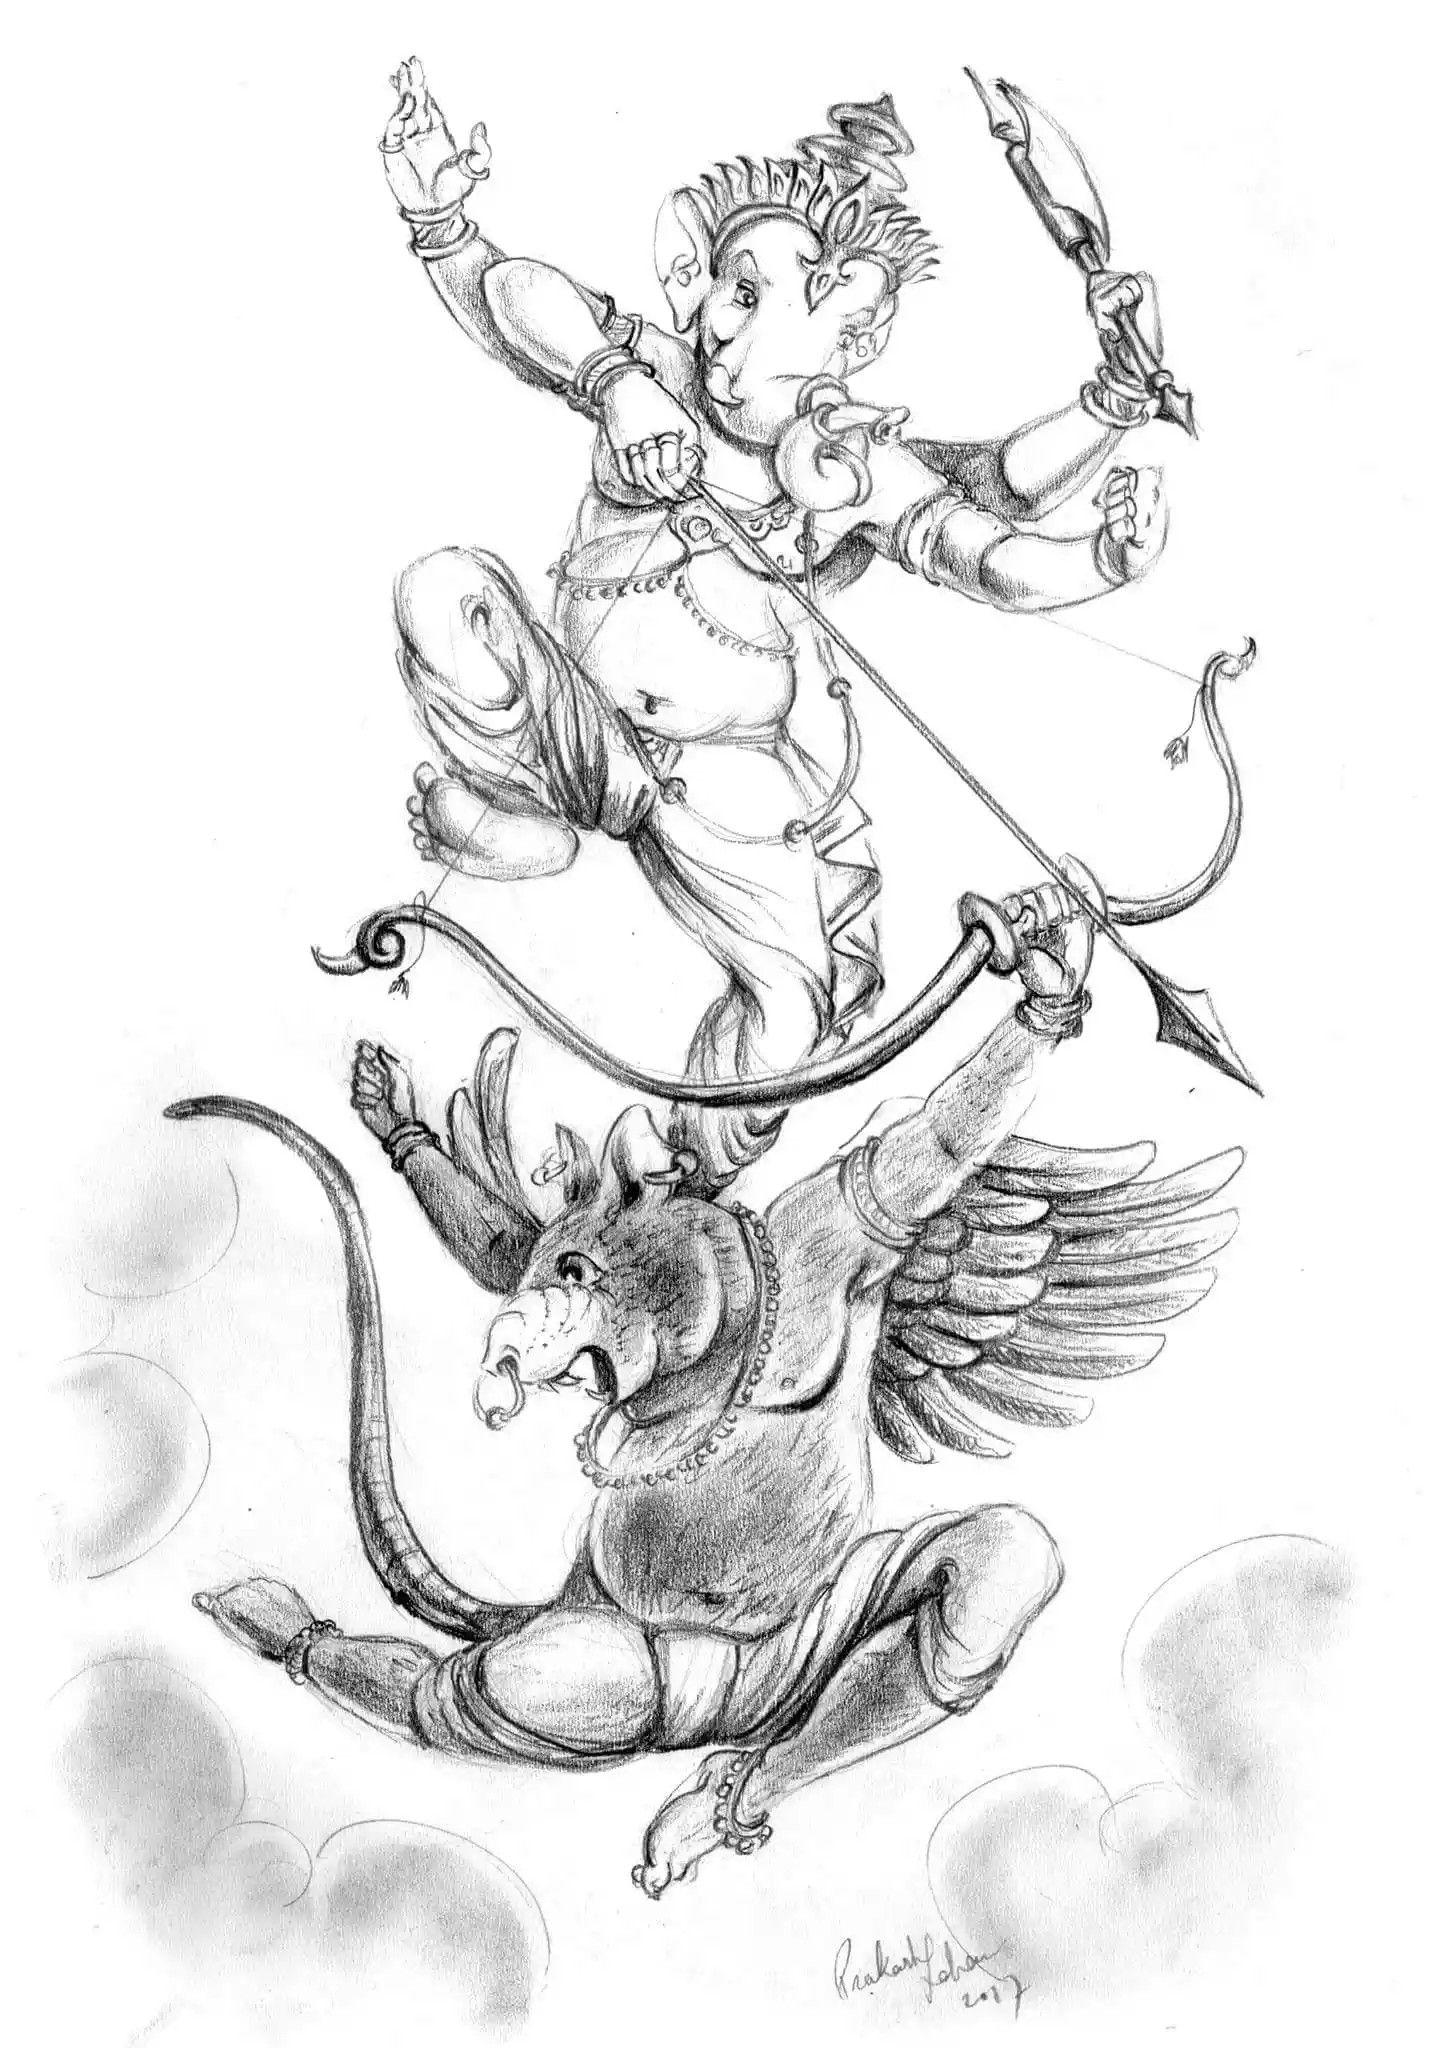 Pin by RAJ GAMBHIR on Ganesh art | Sketches, Ganesh art ...